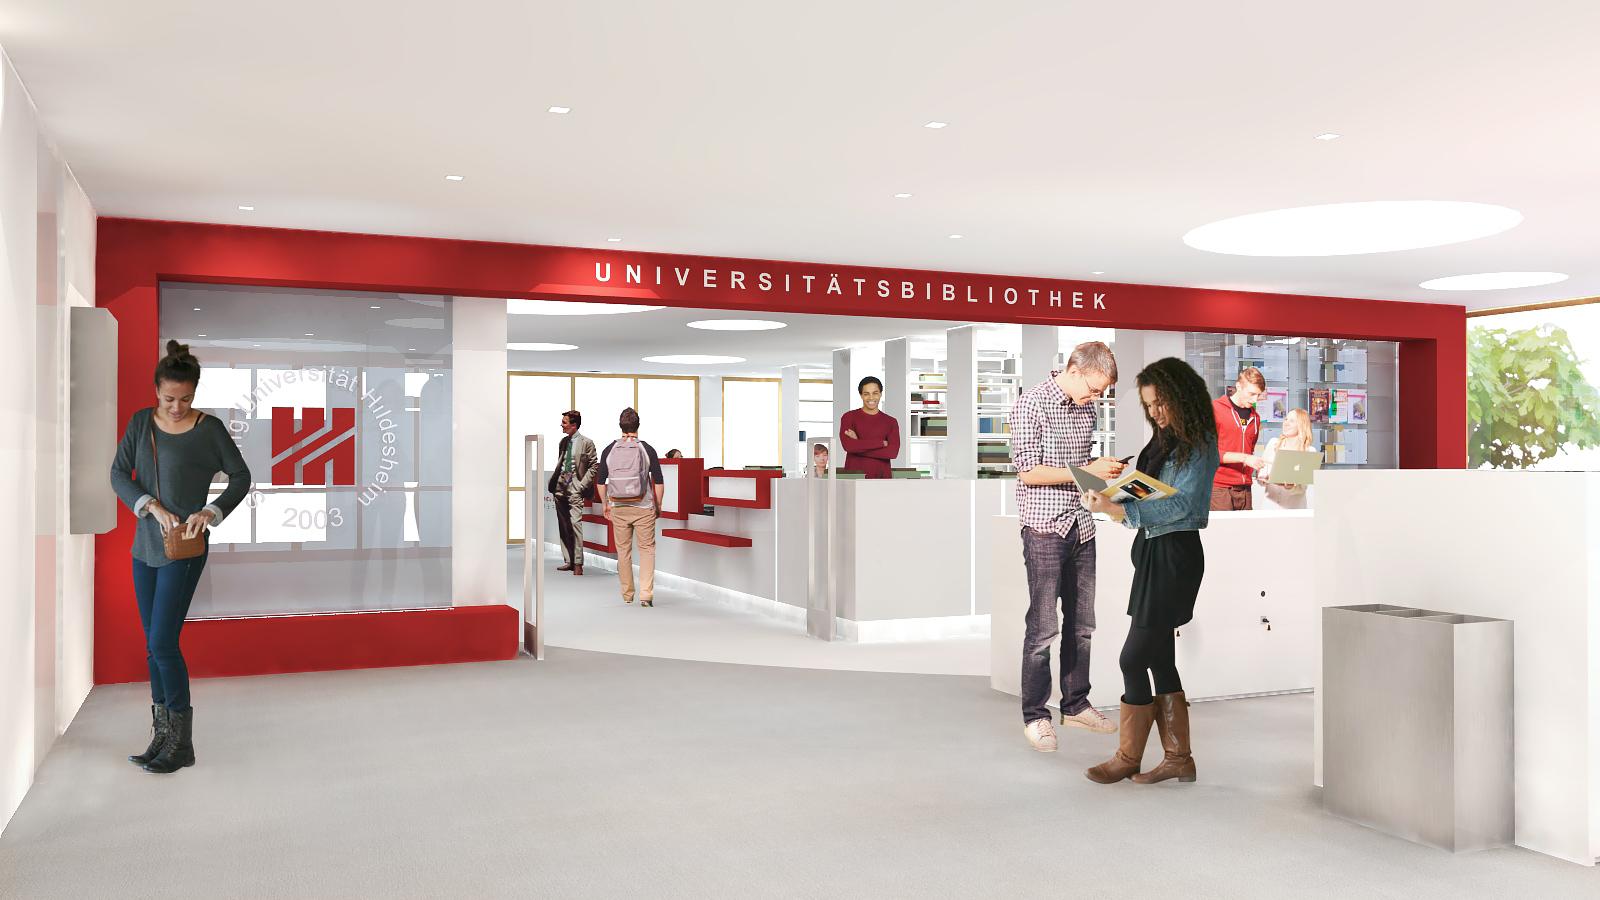 Universität Hildesheim Bibliothek | JUNG - Architekturbüro, Innenarchitekturbüro Hildesheim